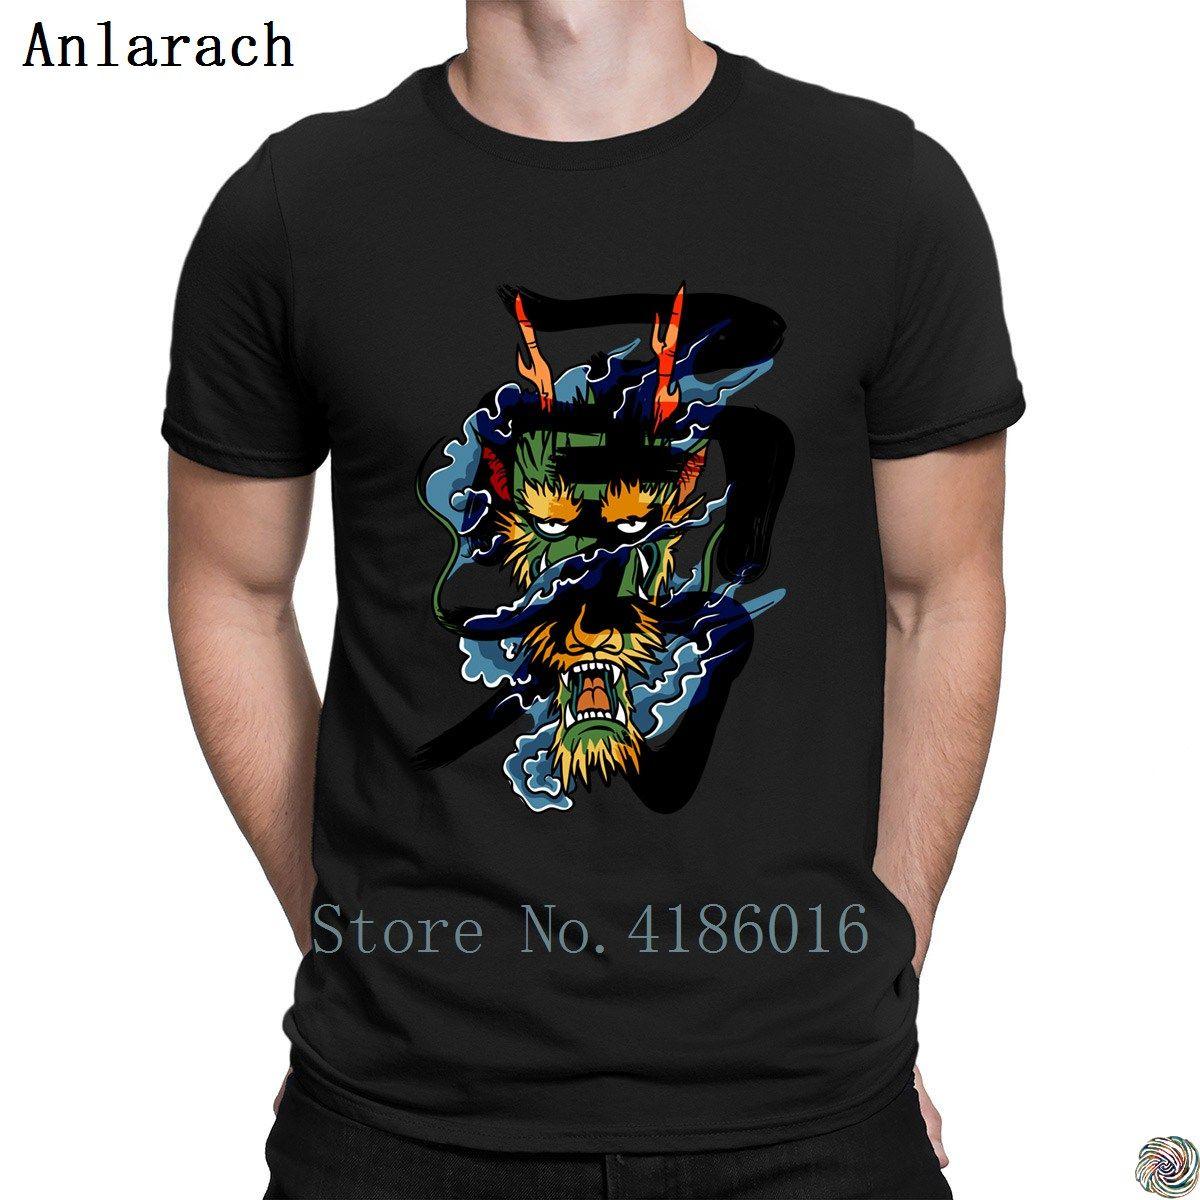 Brave Dragon T-Shirt Letters Short Sleeve HipHop Tops homme Männer-T-Shirt personalisierten Slogan Sommer Anlarach besten